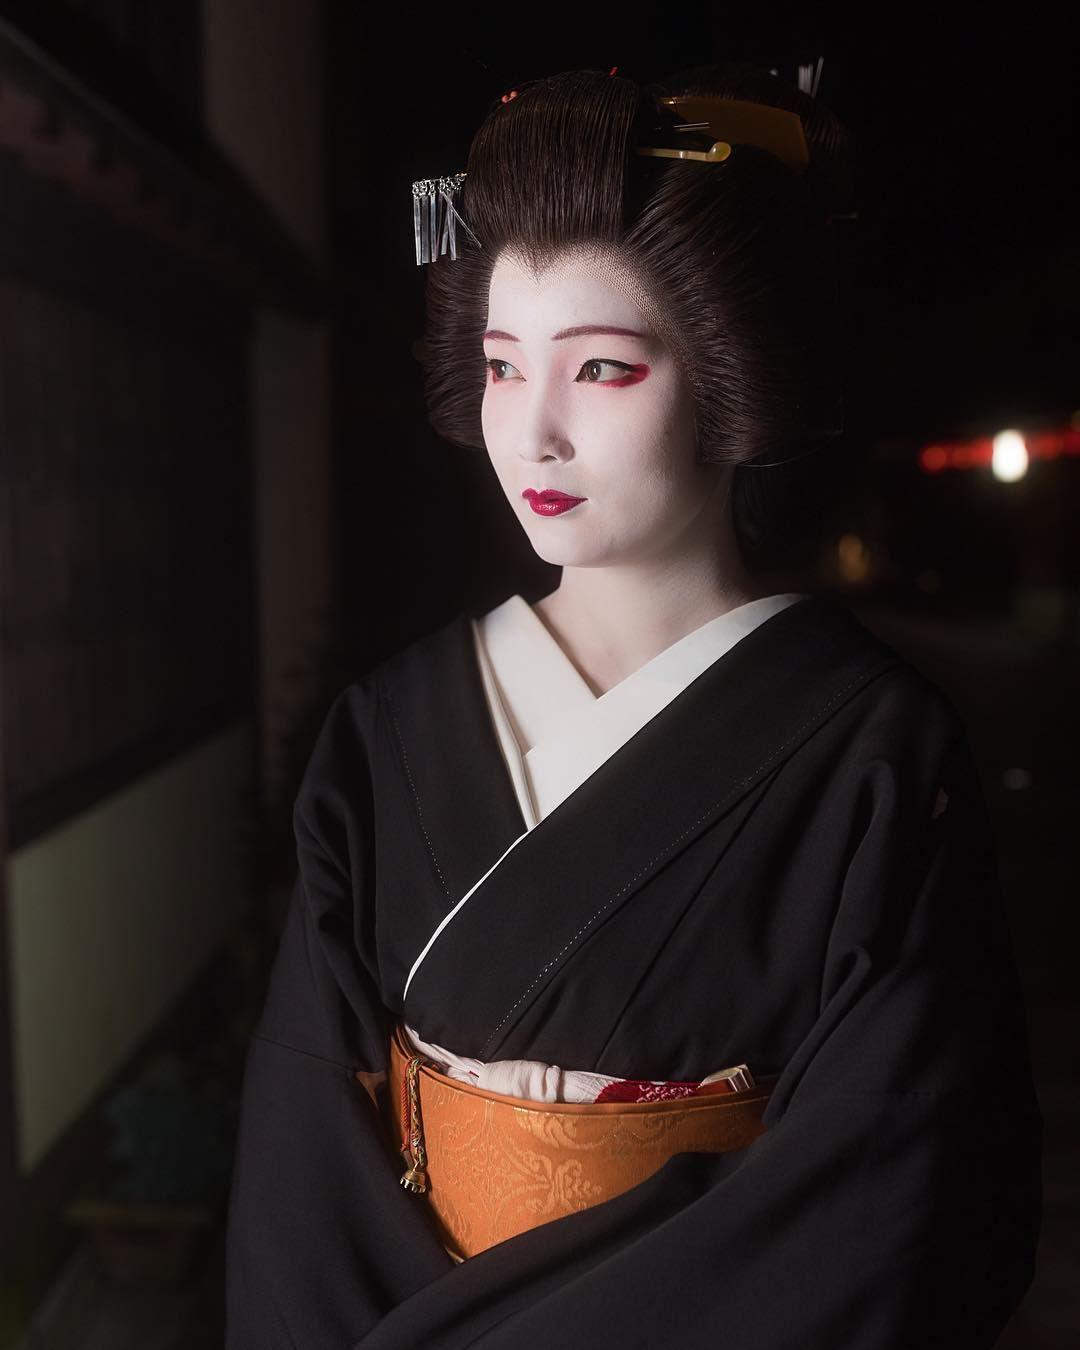 87 Best Beauty Fashion Around The World Images On: いいね!87件、コメント7件 ― Kinmokuseiさん(@fragrantolive11)のInstagram